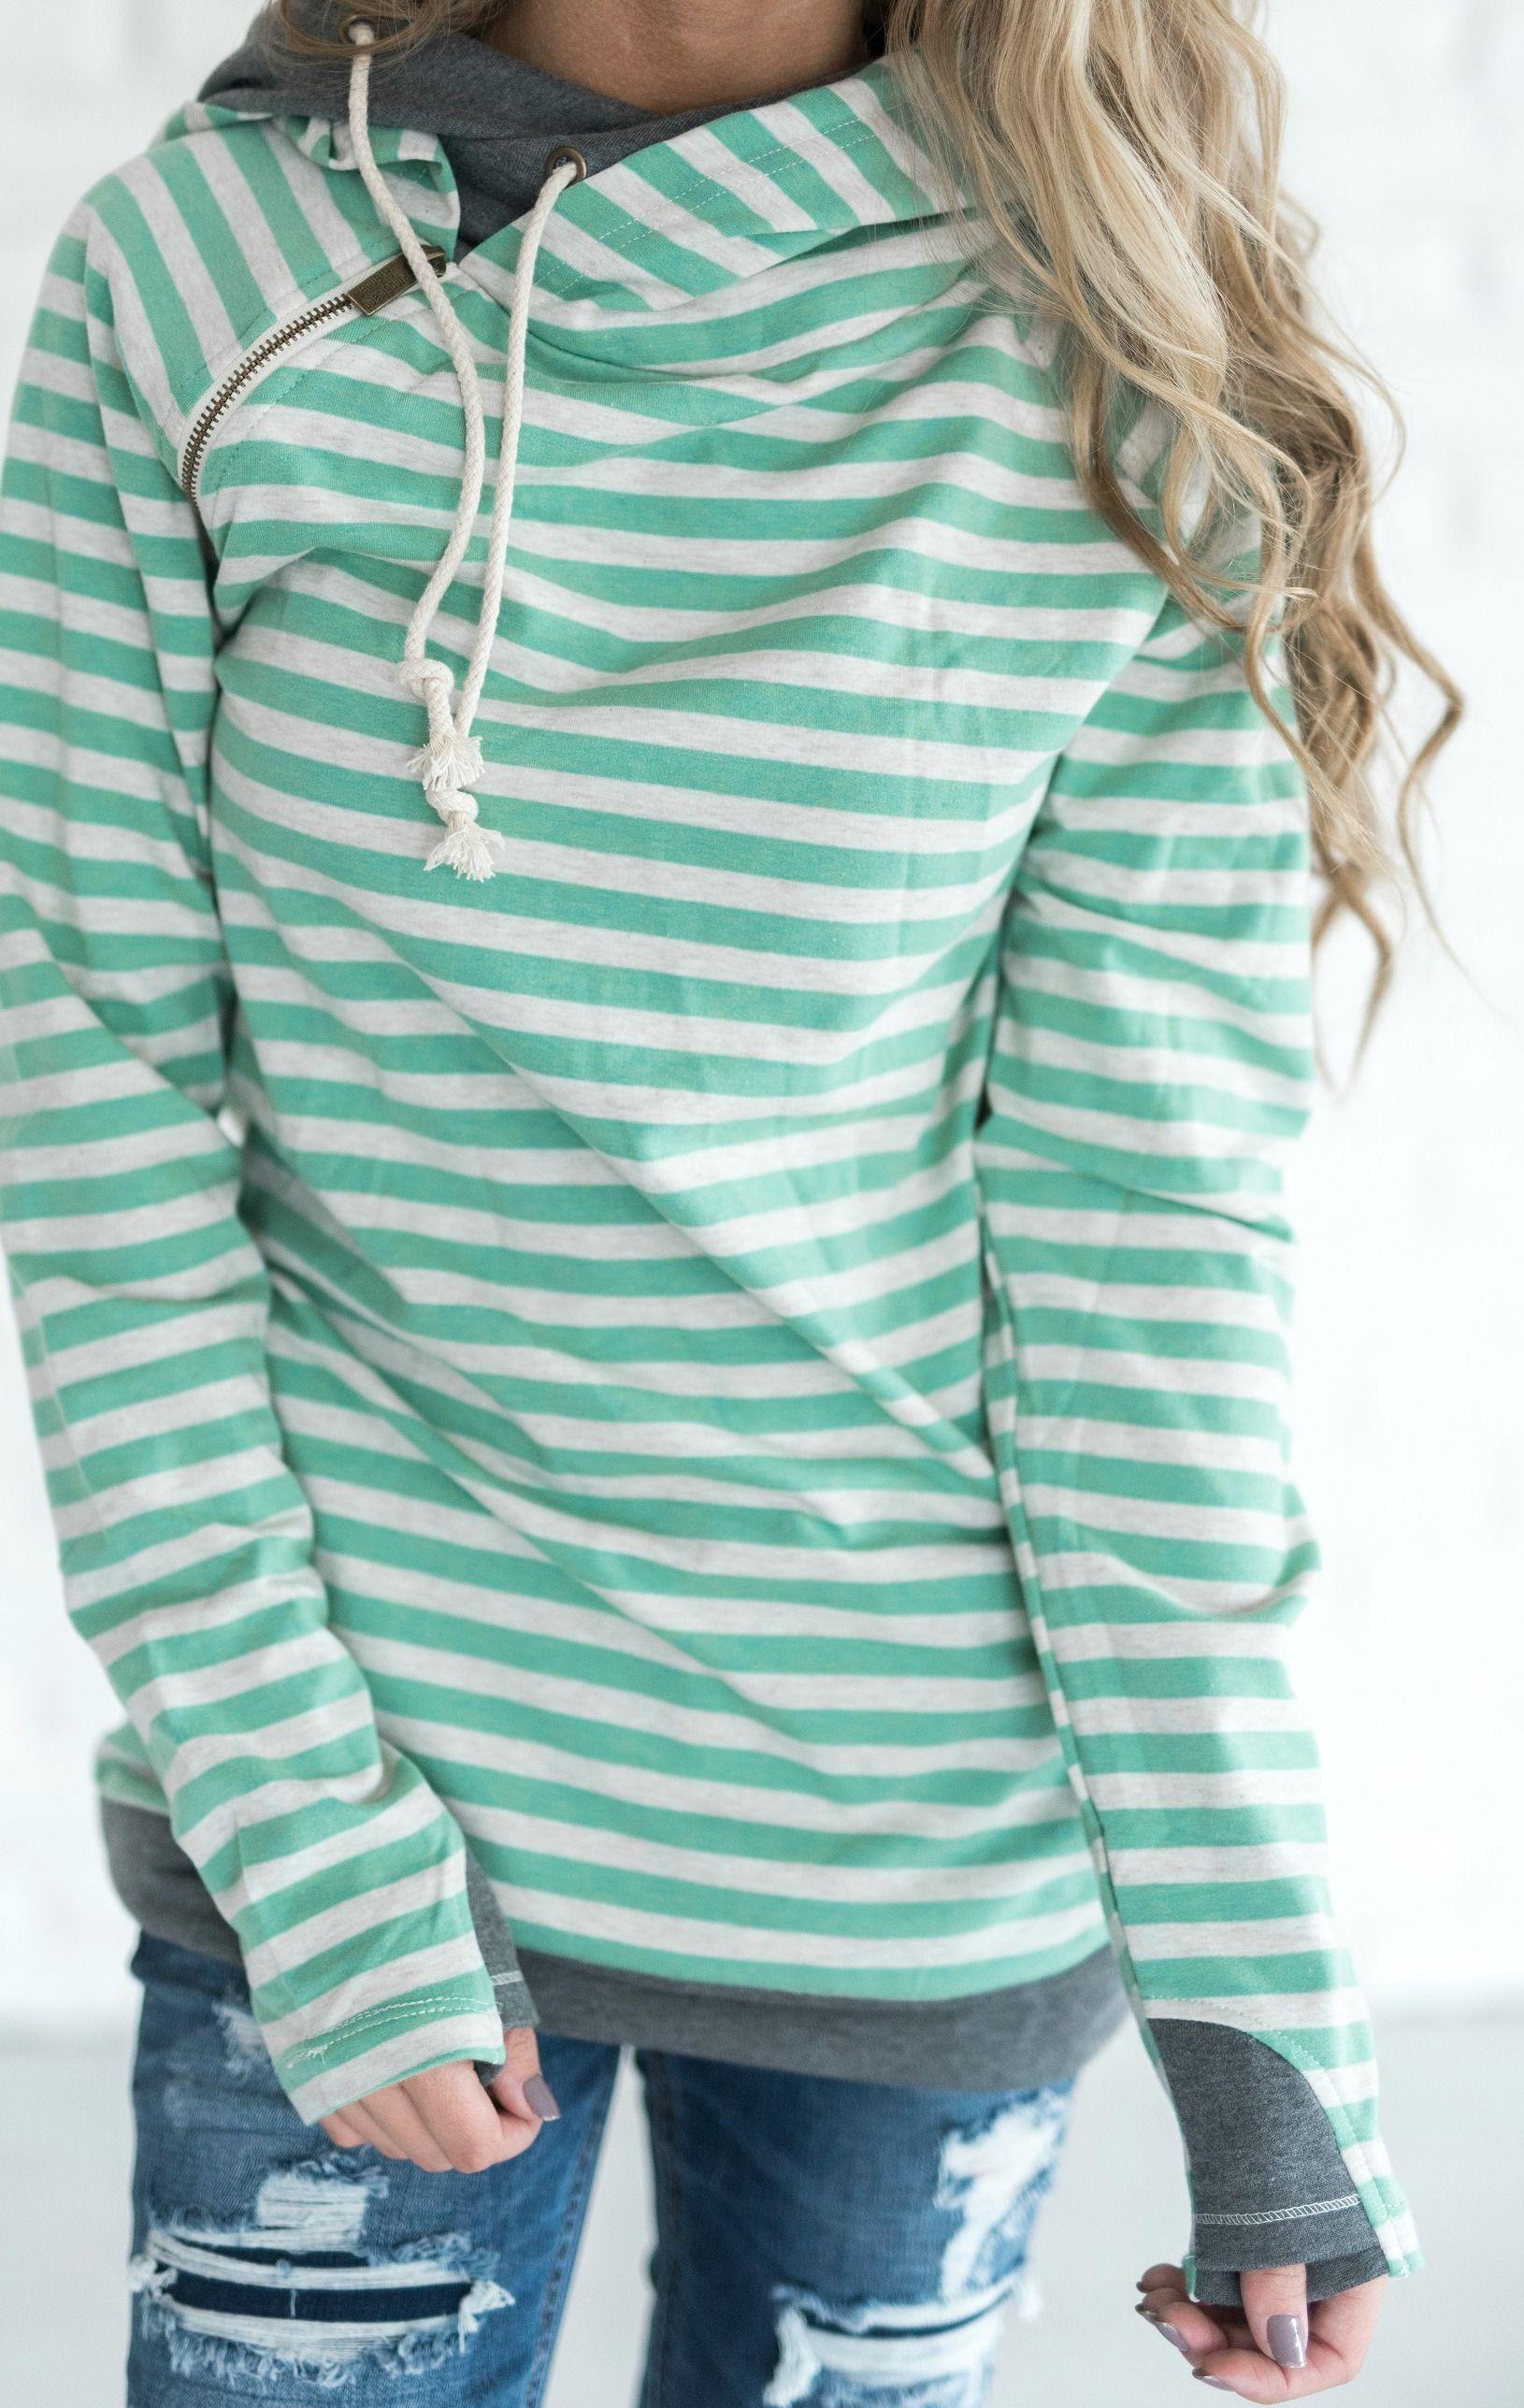 DoubleHood™ Sweatshirt - Mint Stripe | Cozy and Weather